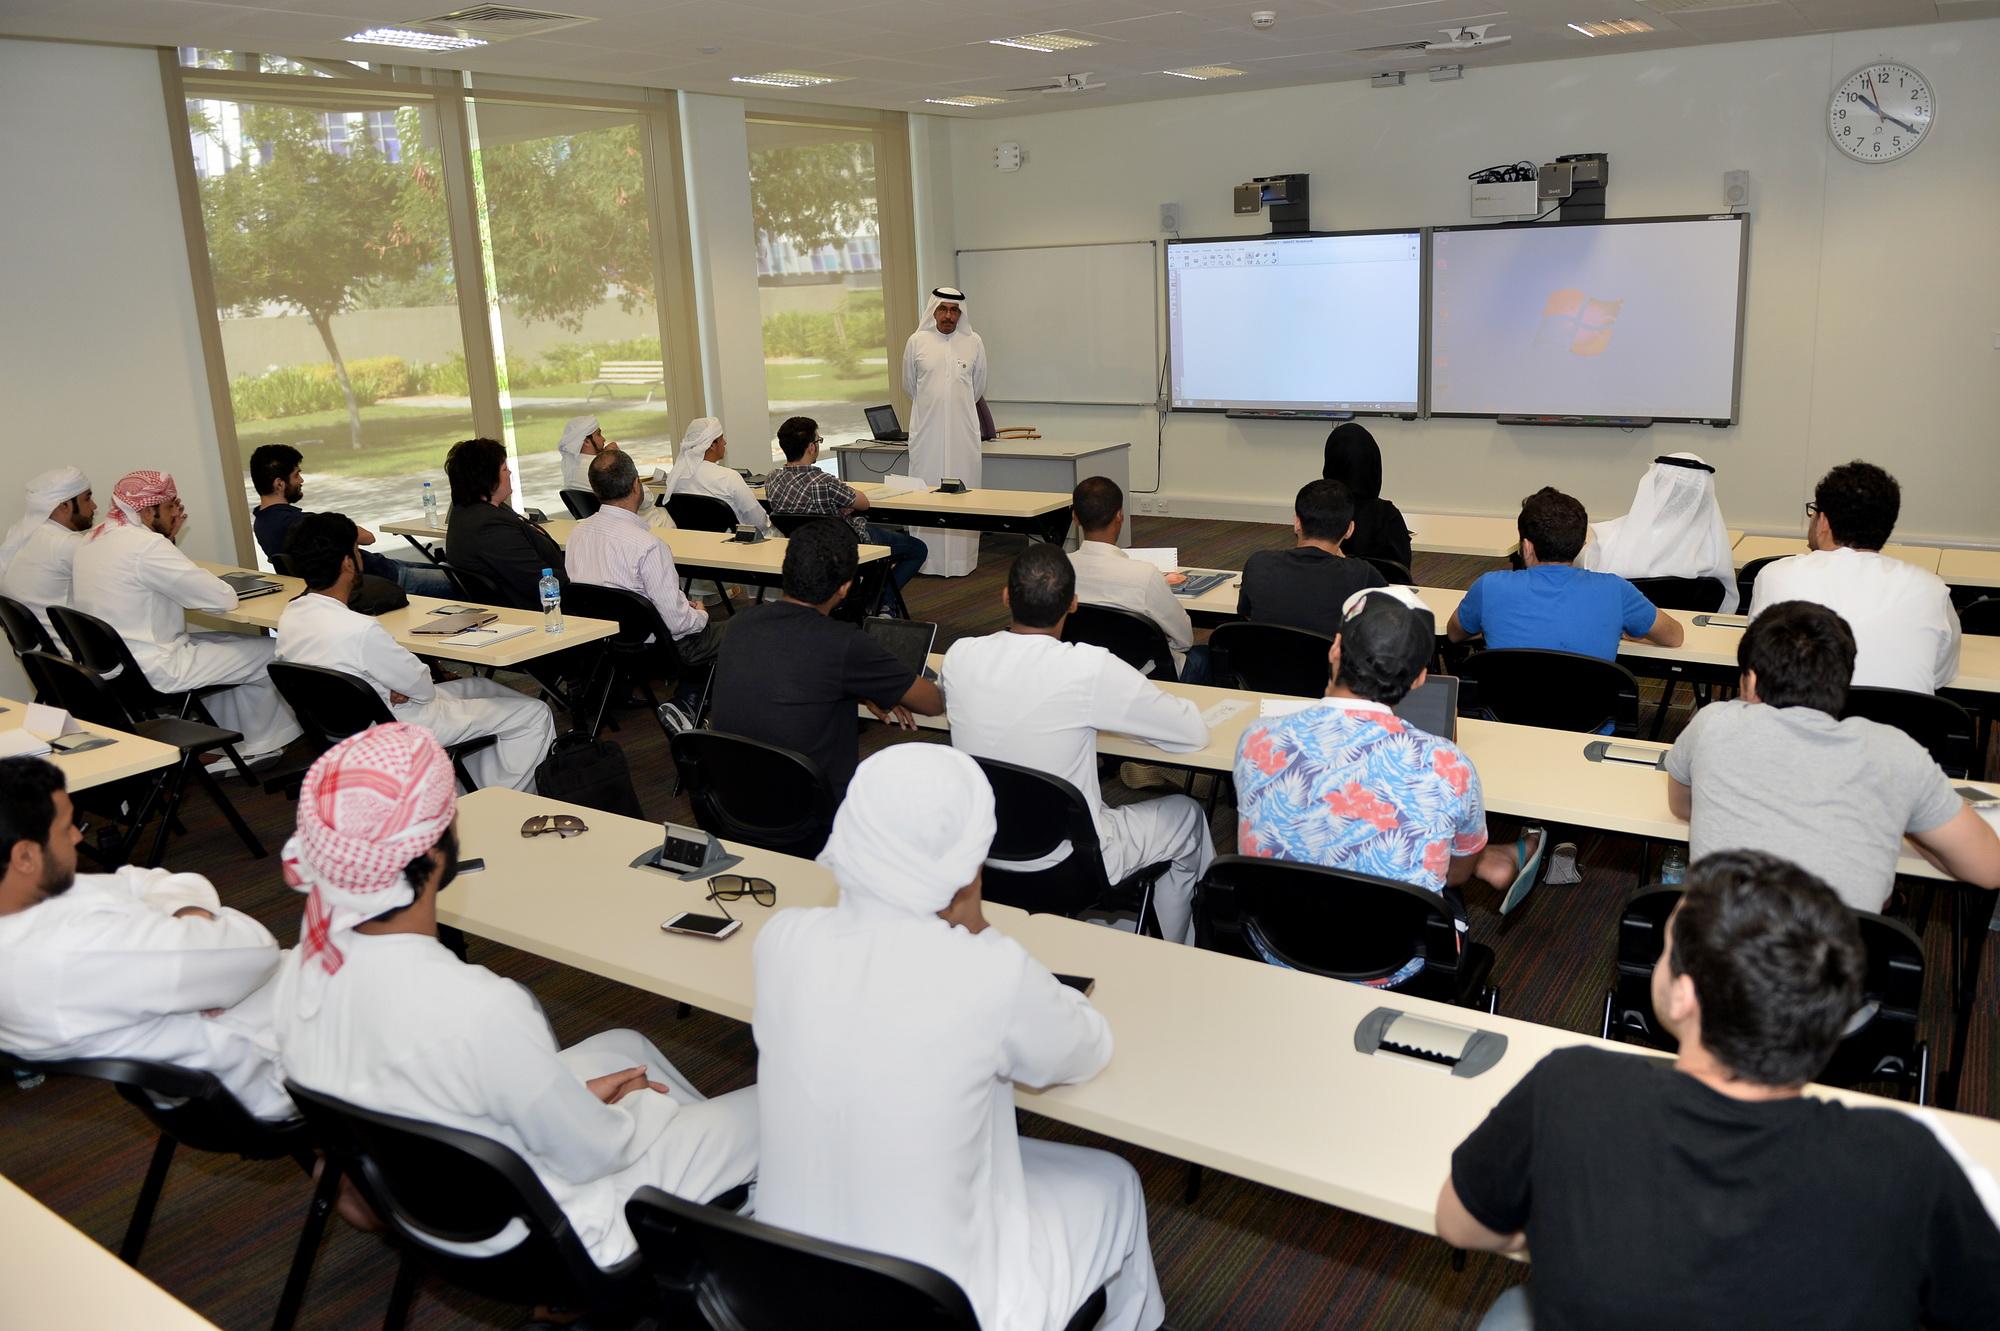 Abdallah Ghobash The United Arab Emirates University Presents An Elite Option For Any Uae Citizen